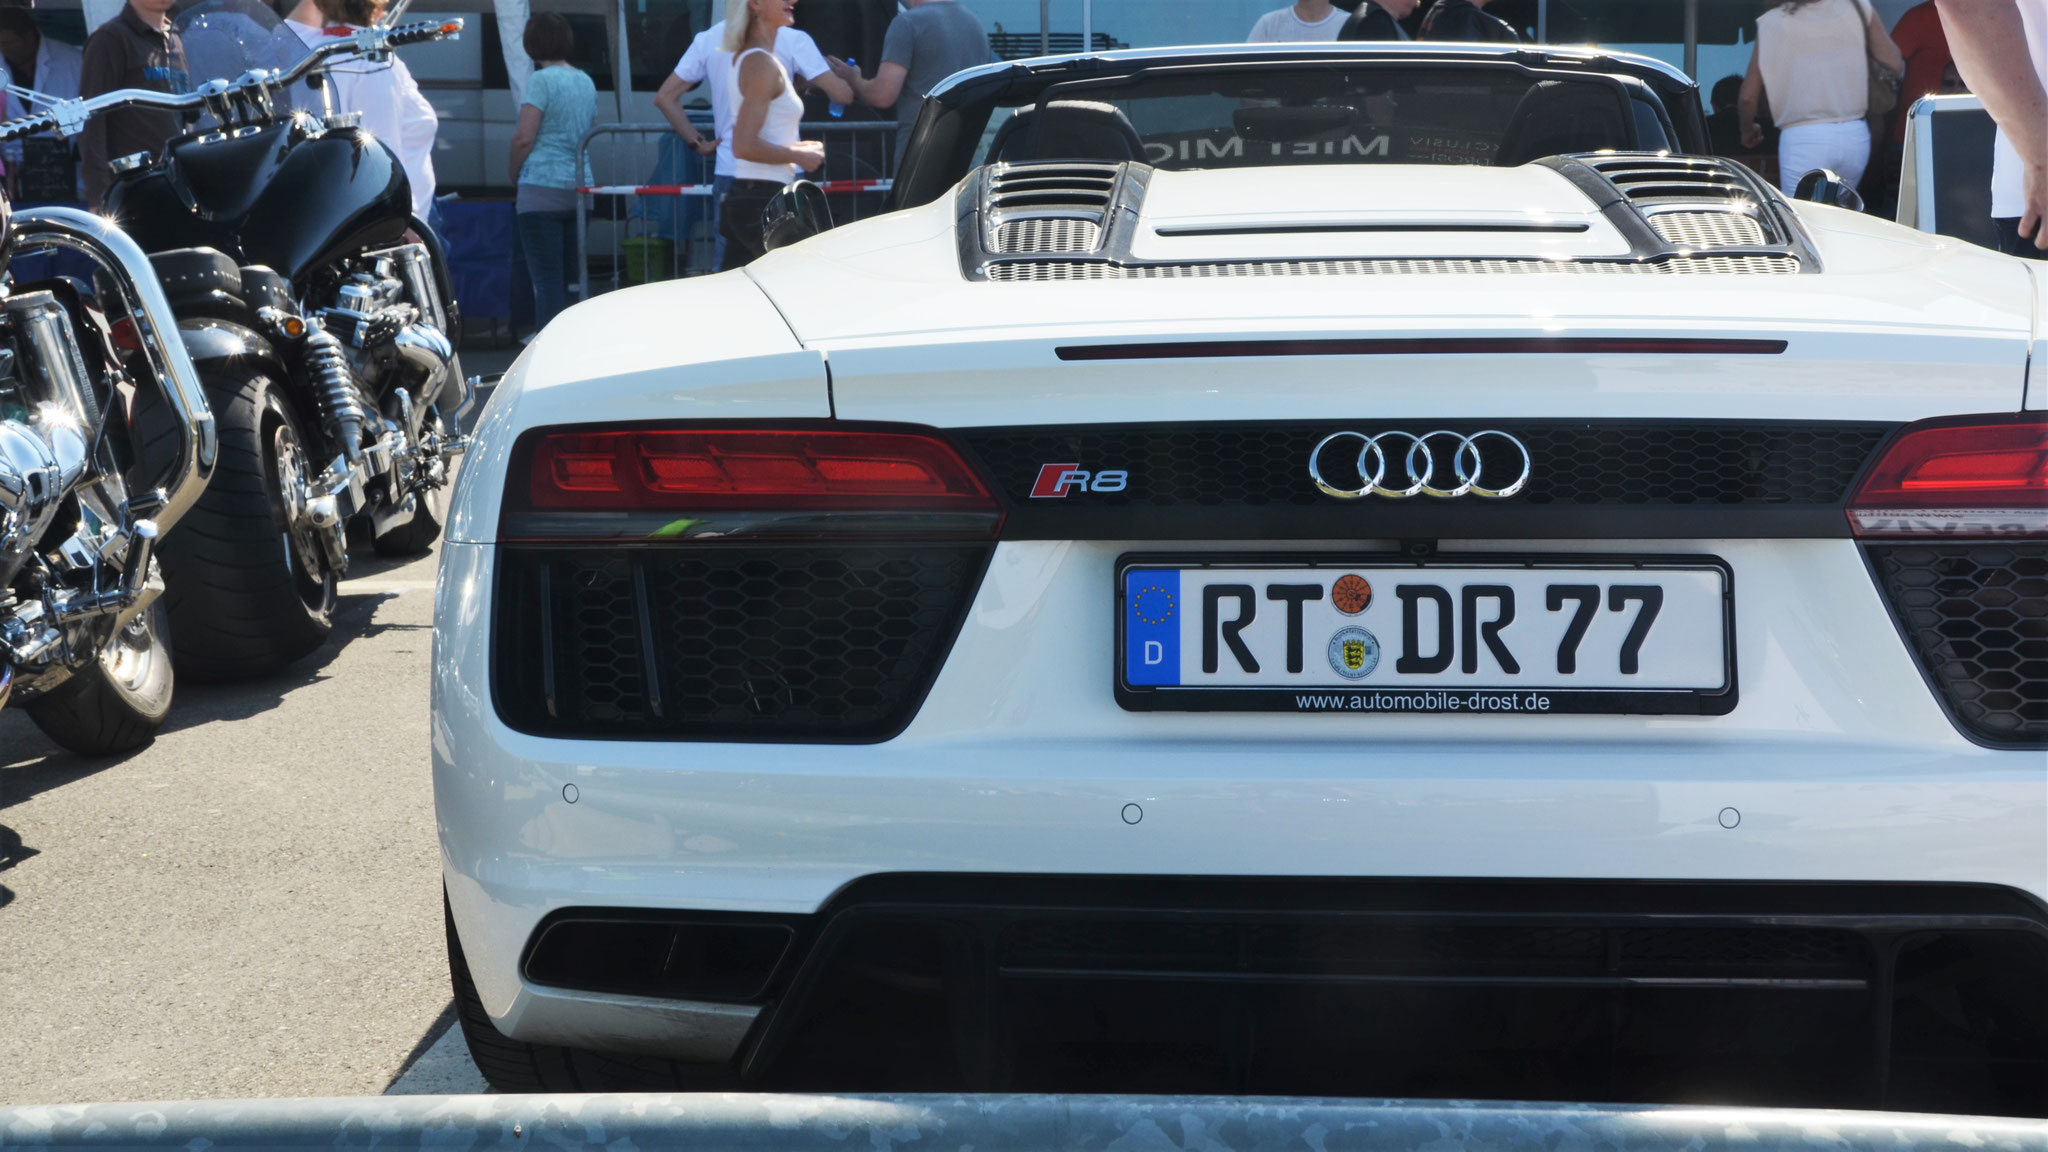 Audi R8 V10 Spyder - RT-DR-77